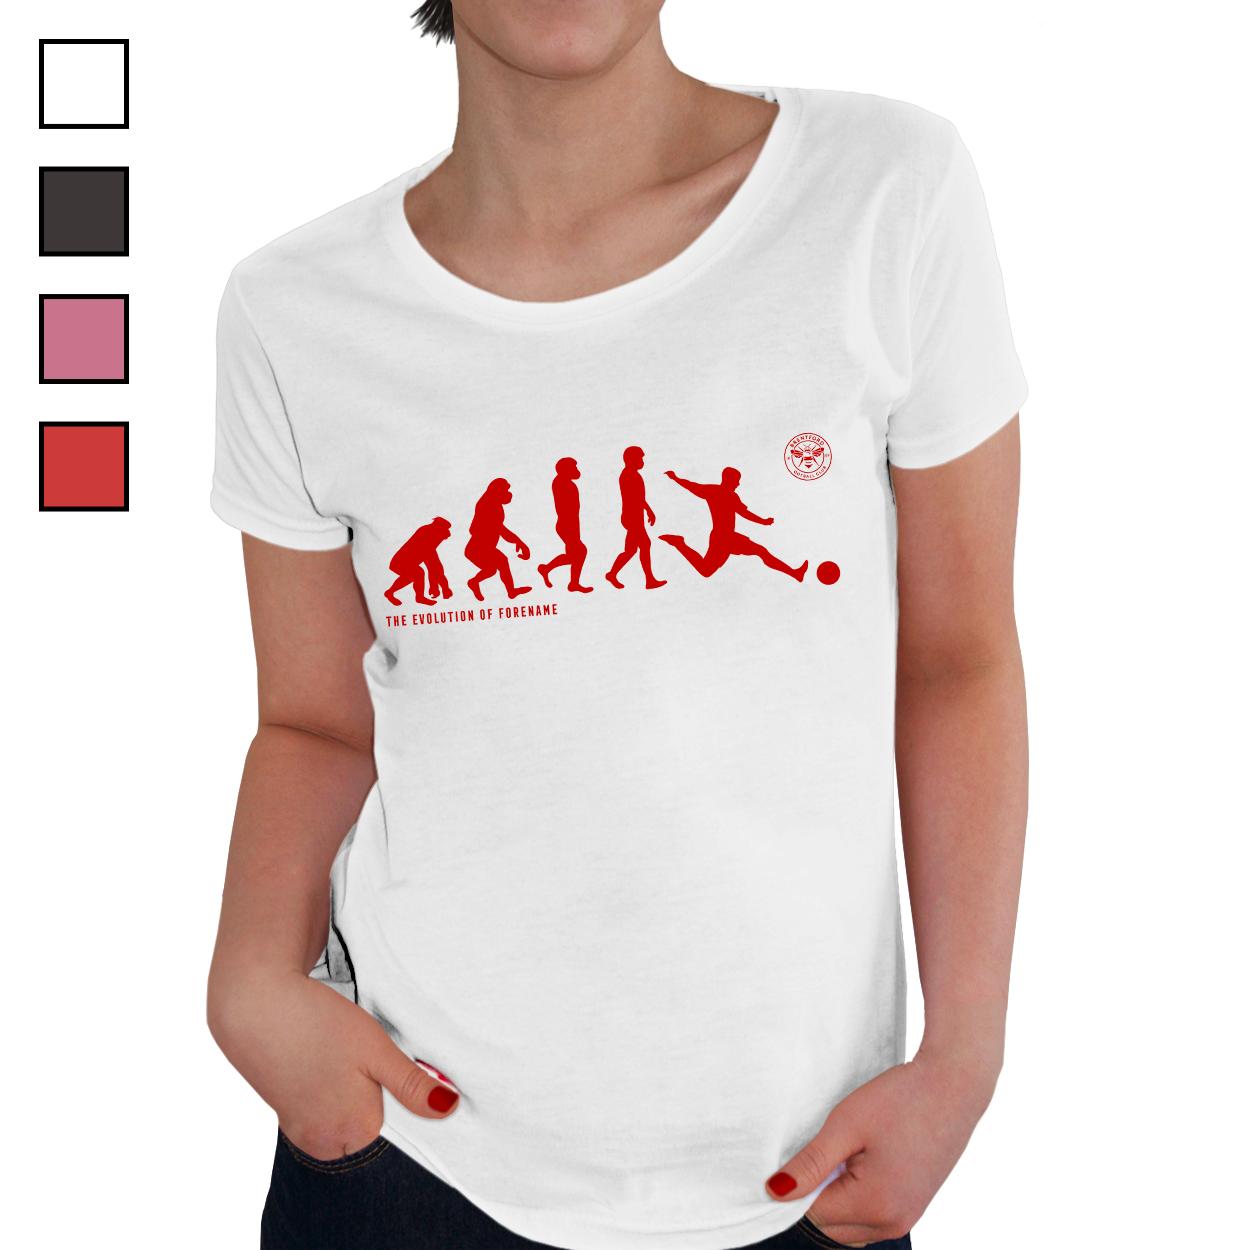 Brentford Evolution Ladies T-Shirt